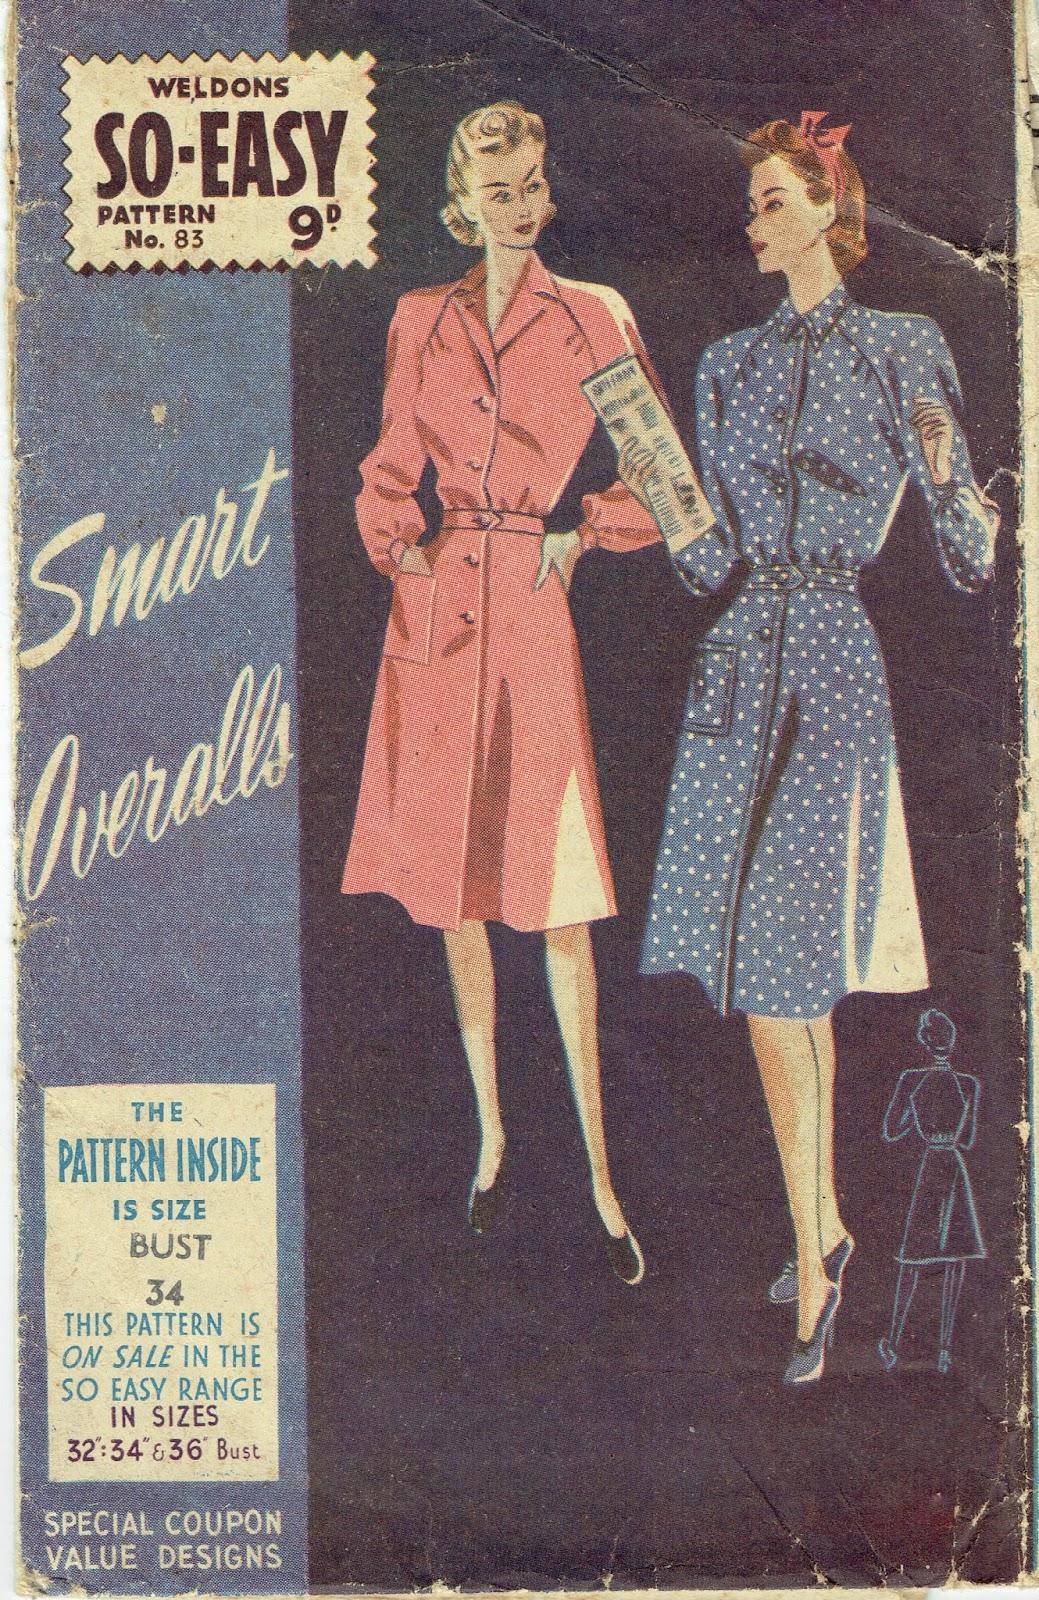 Unsung Sewing Patterns: Weldons No. 83 - Smart Overalls